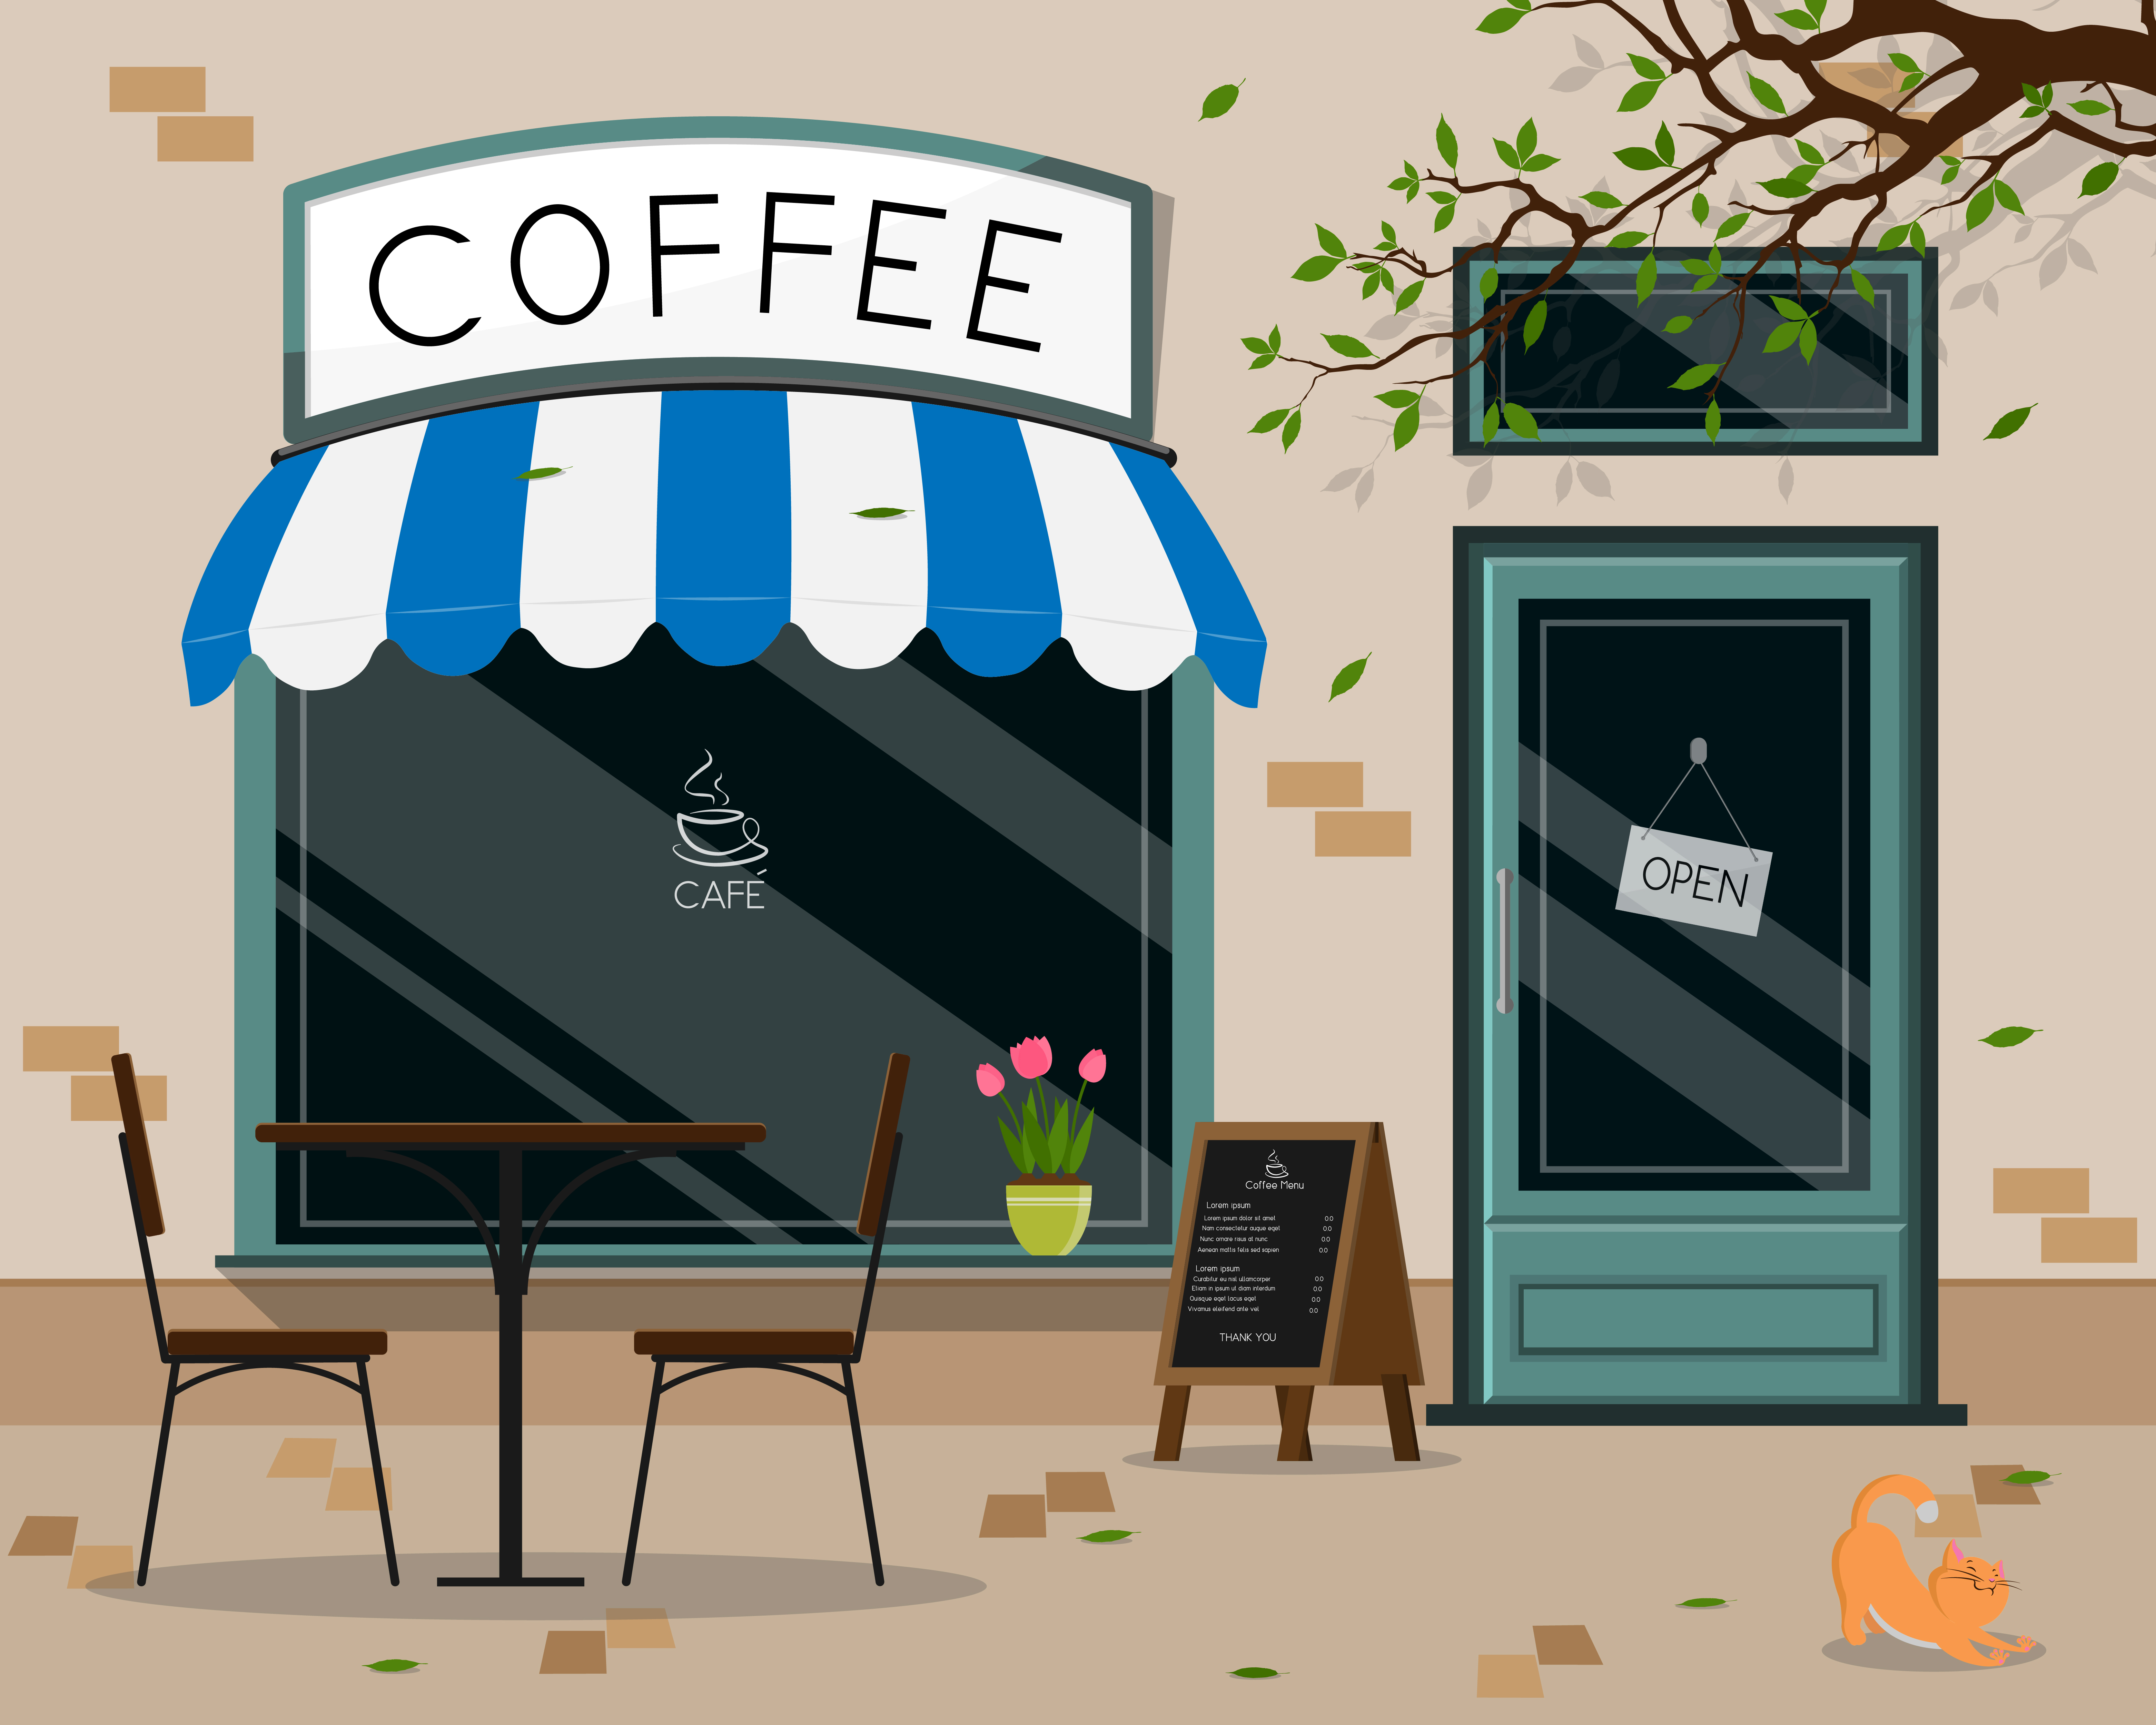 Coffee shop store front - Download Free Vectors, Clipart Graphics & Vector Art